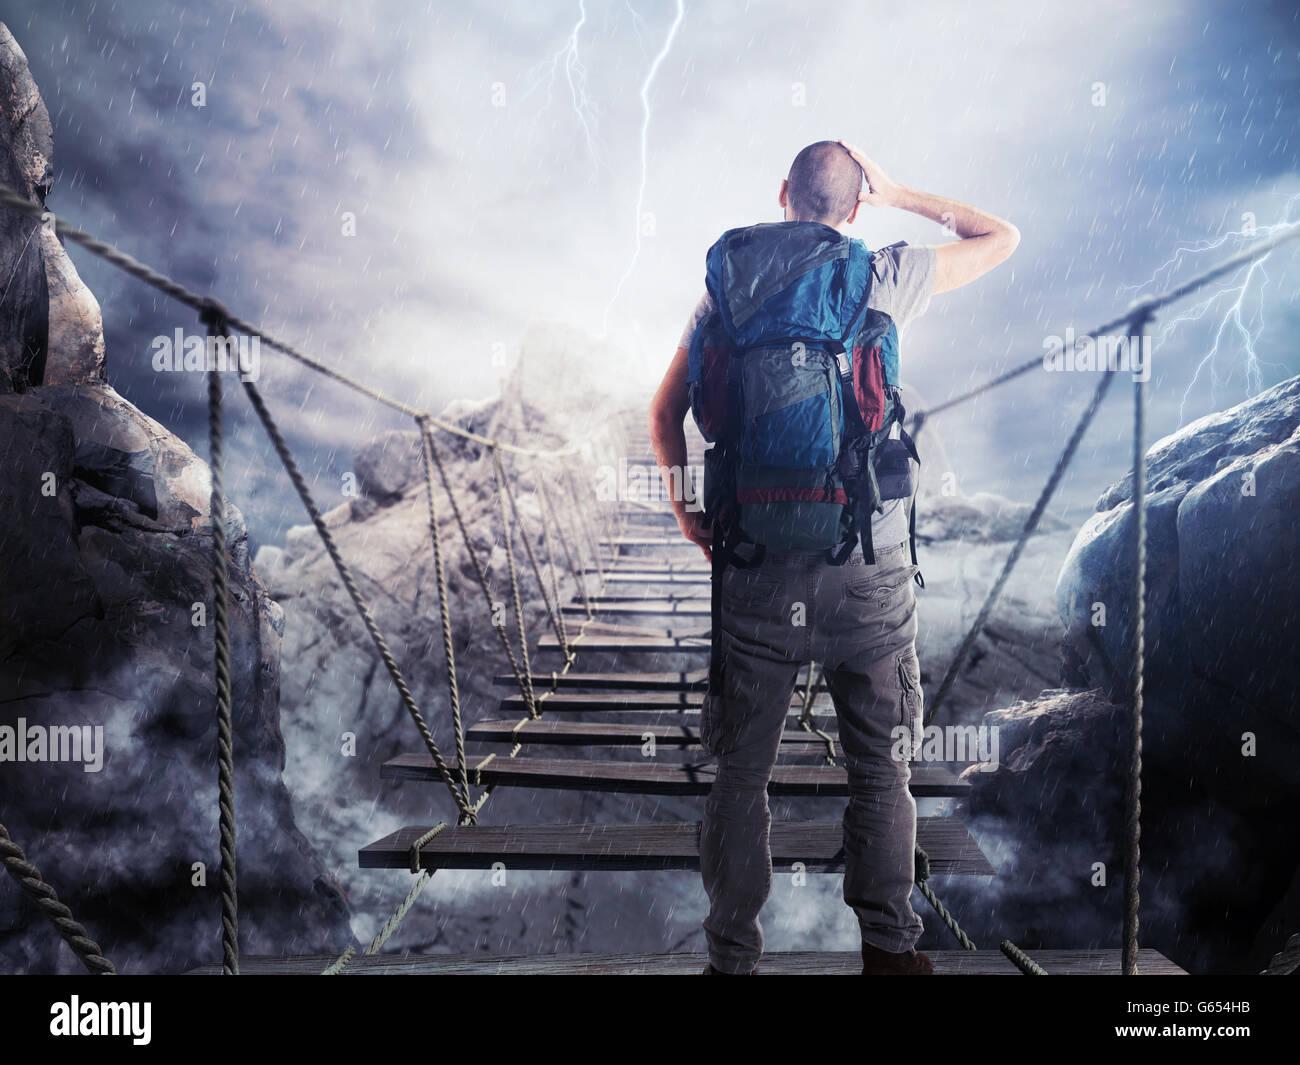 3D Rendering di explorer sul ponte instabile Immagini Stock